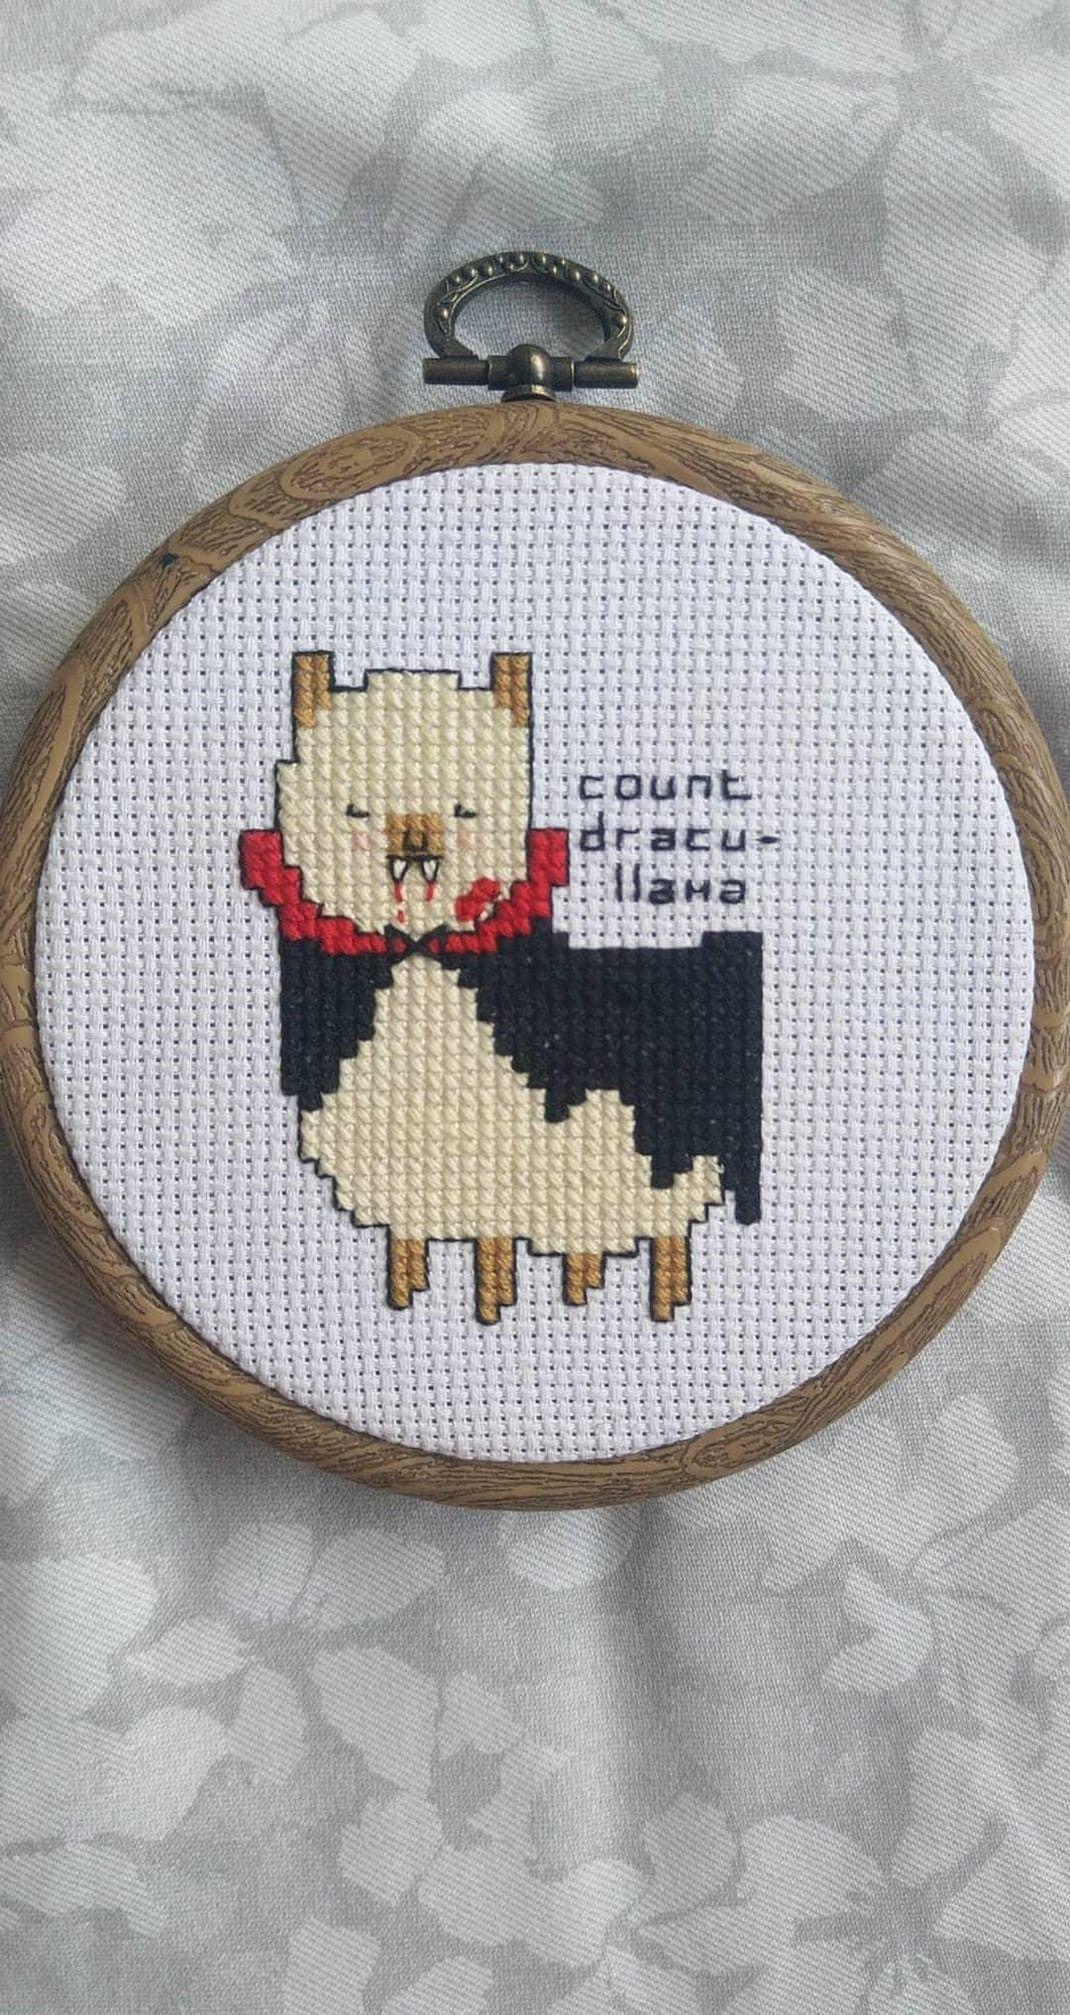 Count Dracu Llama Cross Stitch